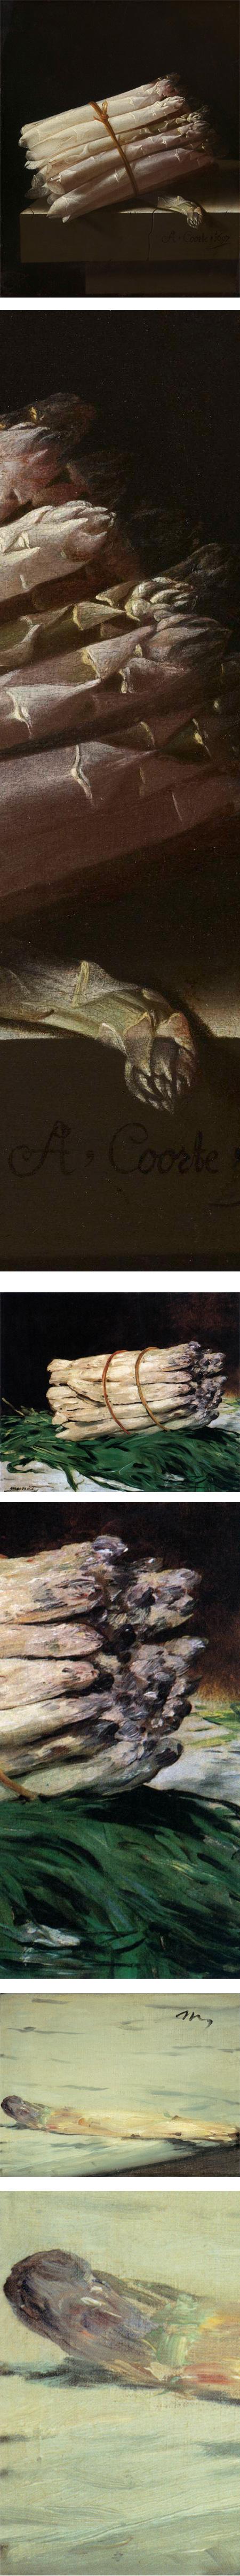 Asparagus, Adriaen Coort, Edouard Manet